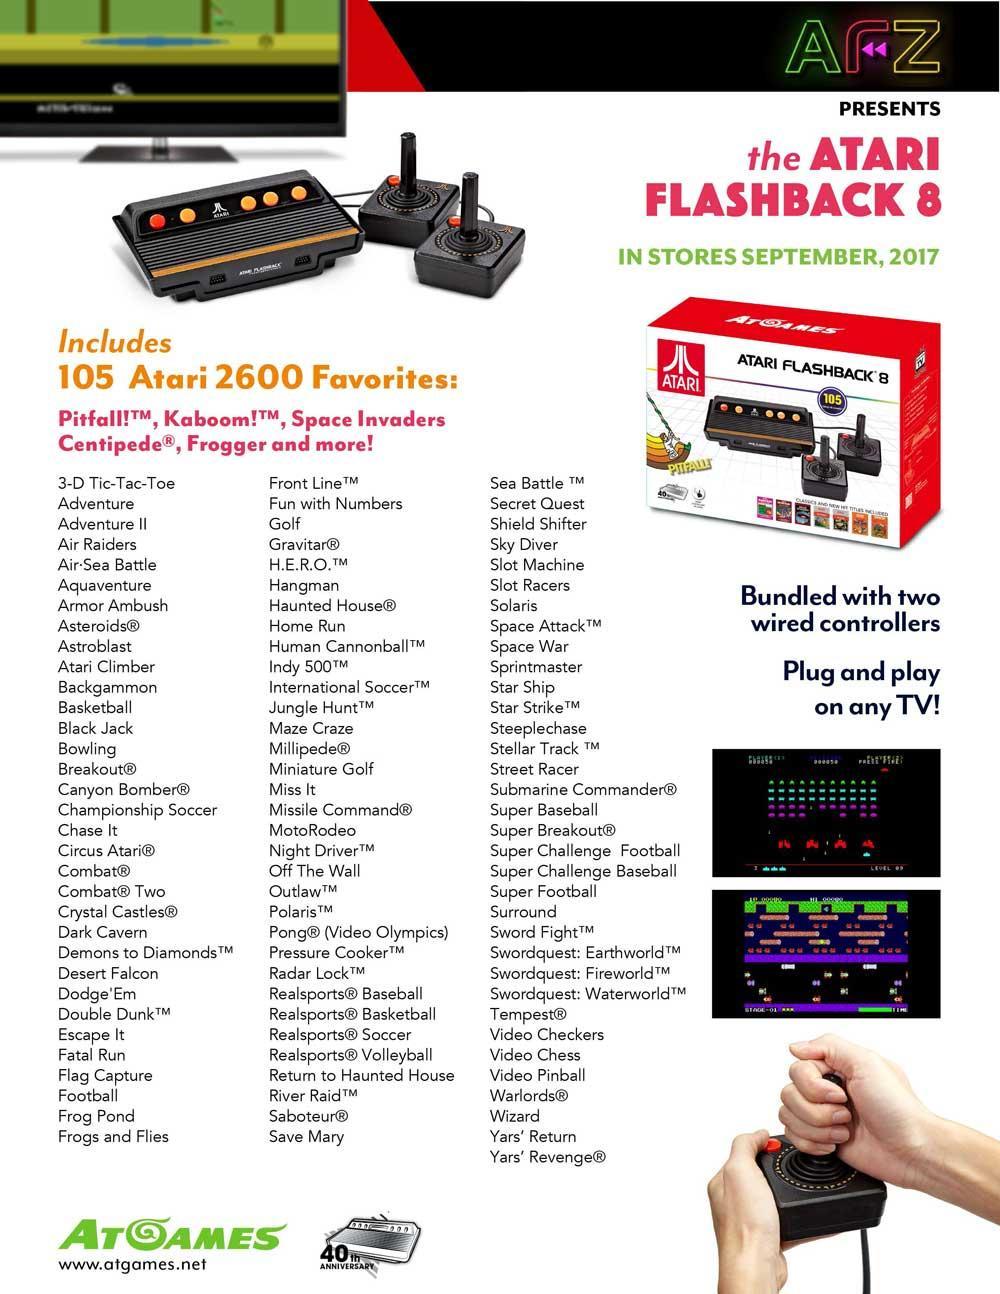 Resucitan la sega genesis y la mega drive en el foro - Atari flashback classic game console game list ...